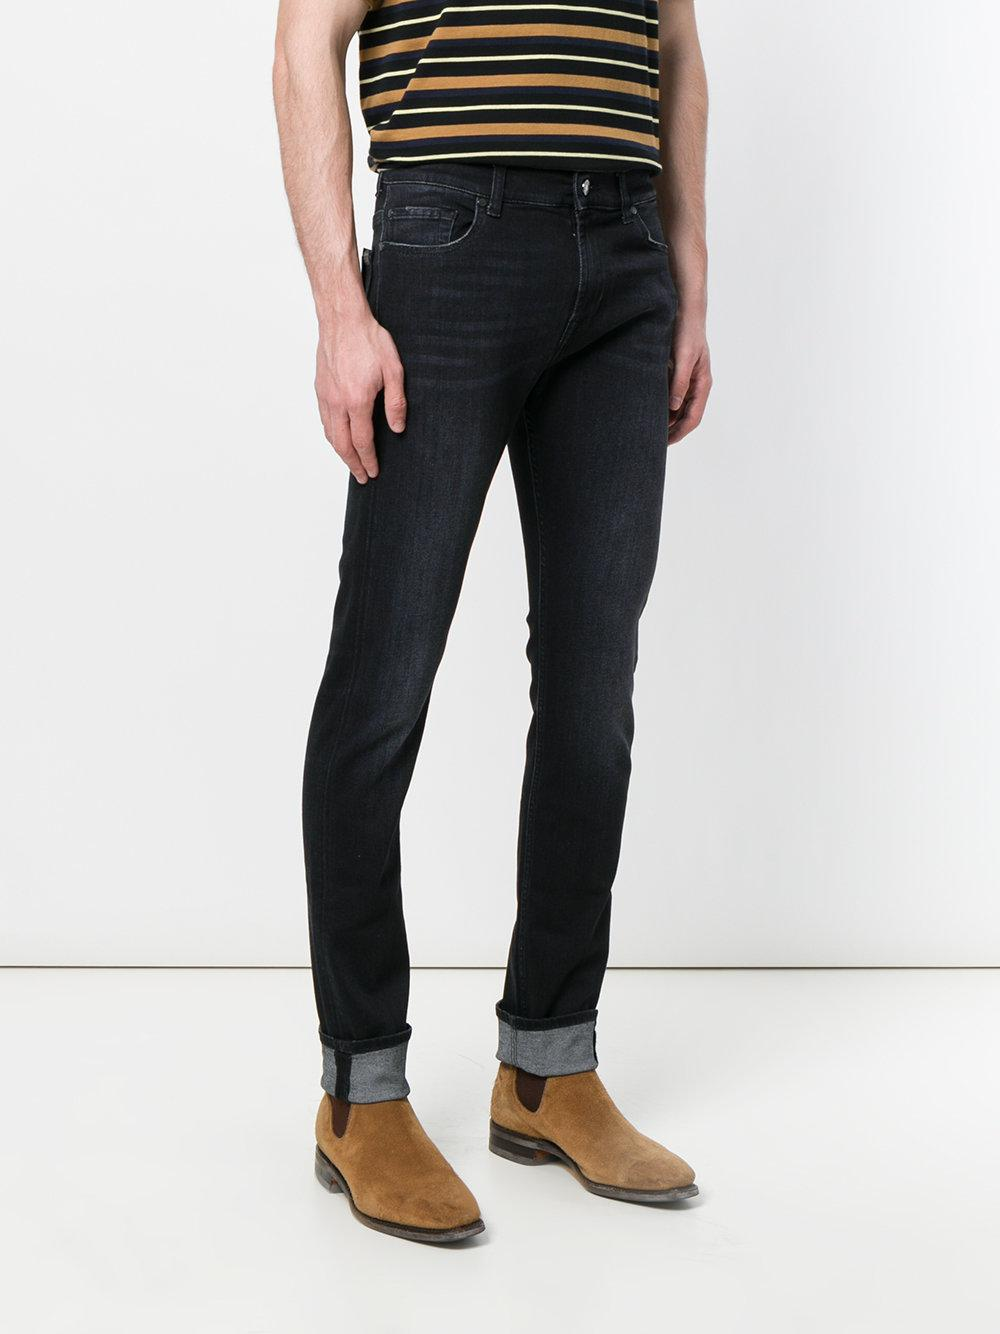 7 For All Mankind Denim Slim Fit Jeans in Black for Men